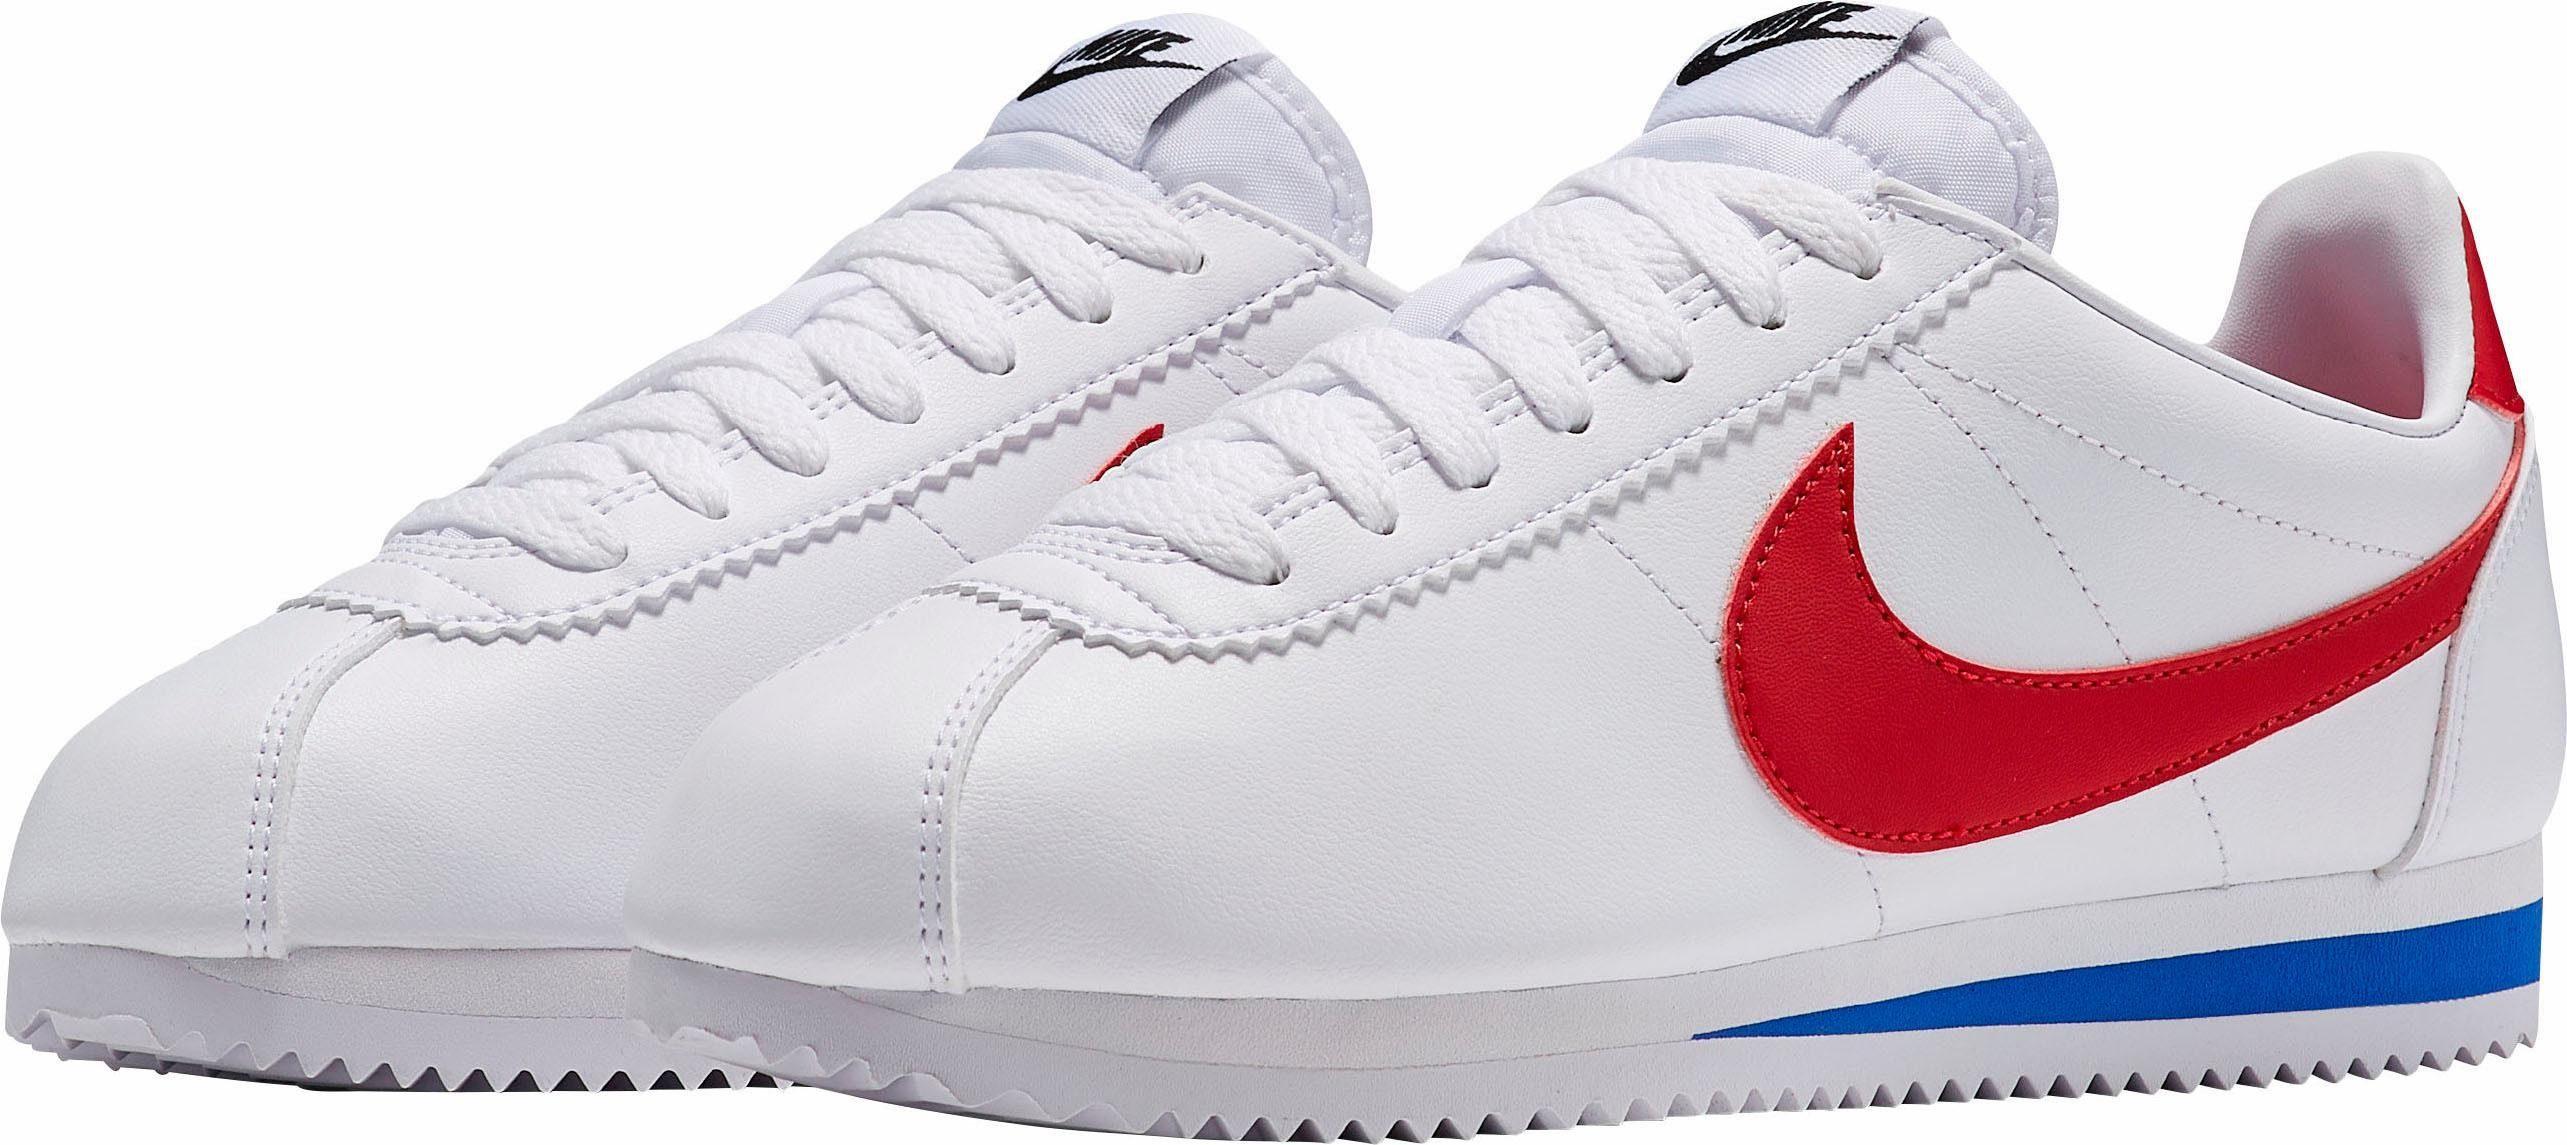 »Wmns Nike Sneaker Sportswear Classic Cortez online kaufenOTTO Leather« SzUqpGLVM